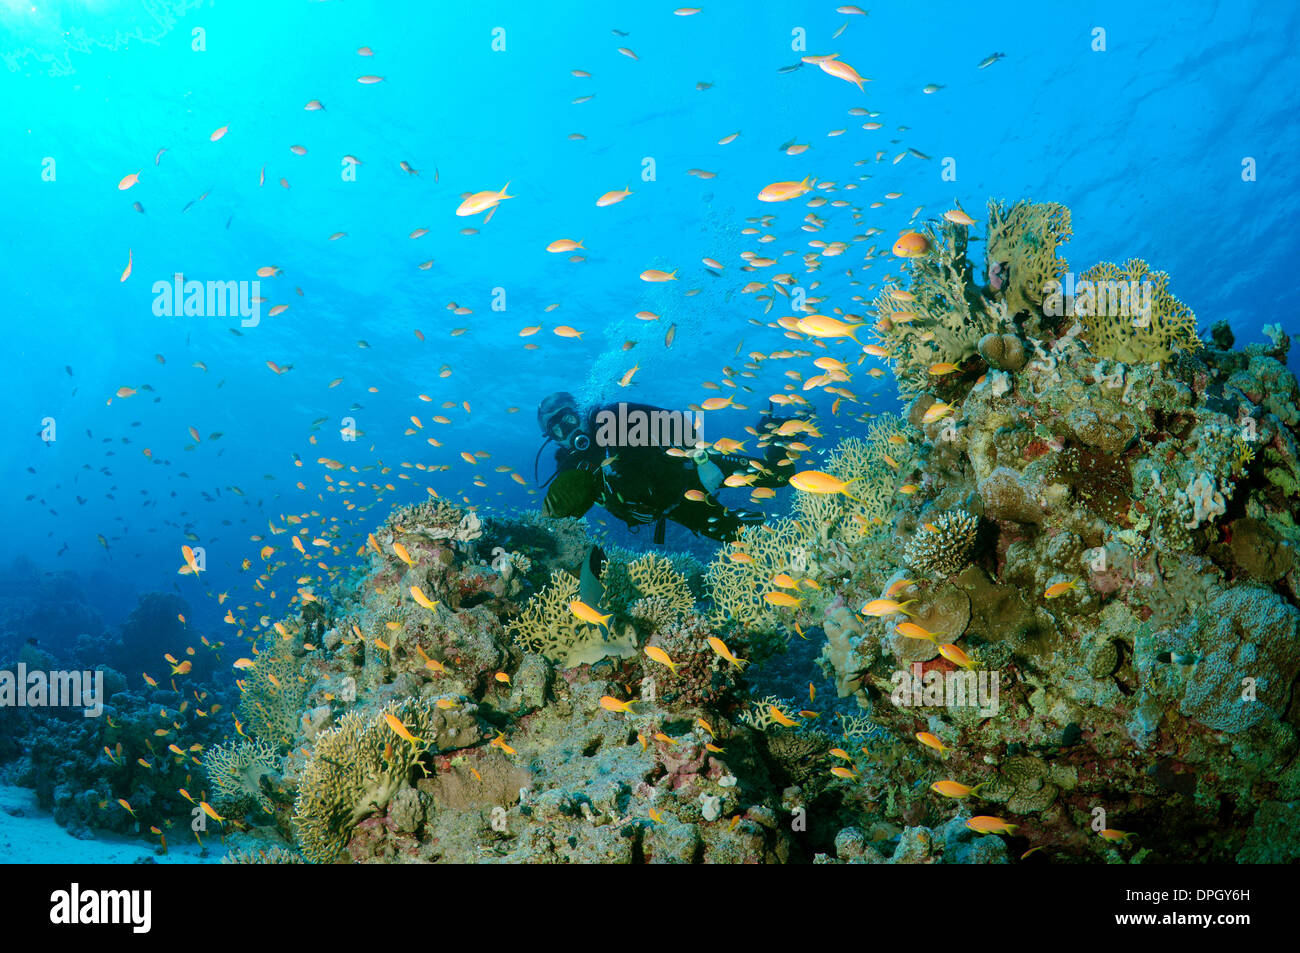 Diver looking at lyretail coralfish, lyretail anthias, sea goldie, or scalefin anthia (Pseudanthias squamipinnis),Red sea, Egypt - Stock Image